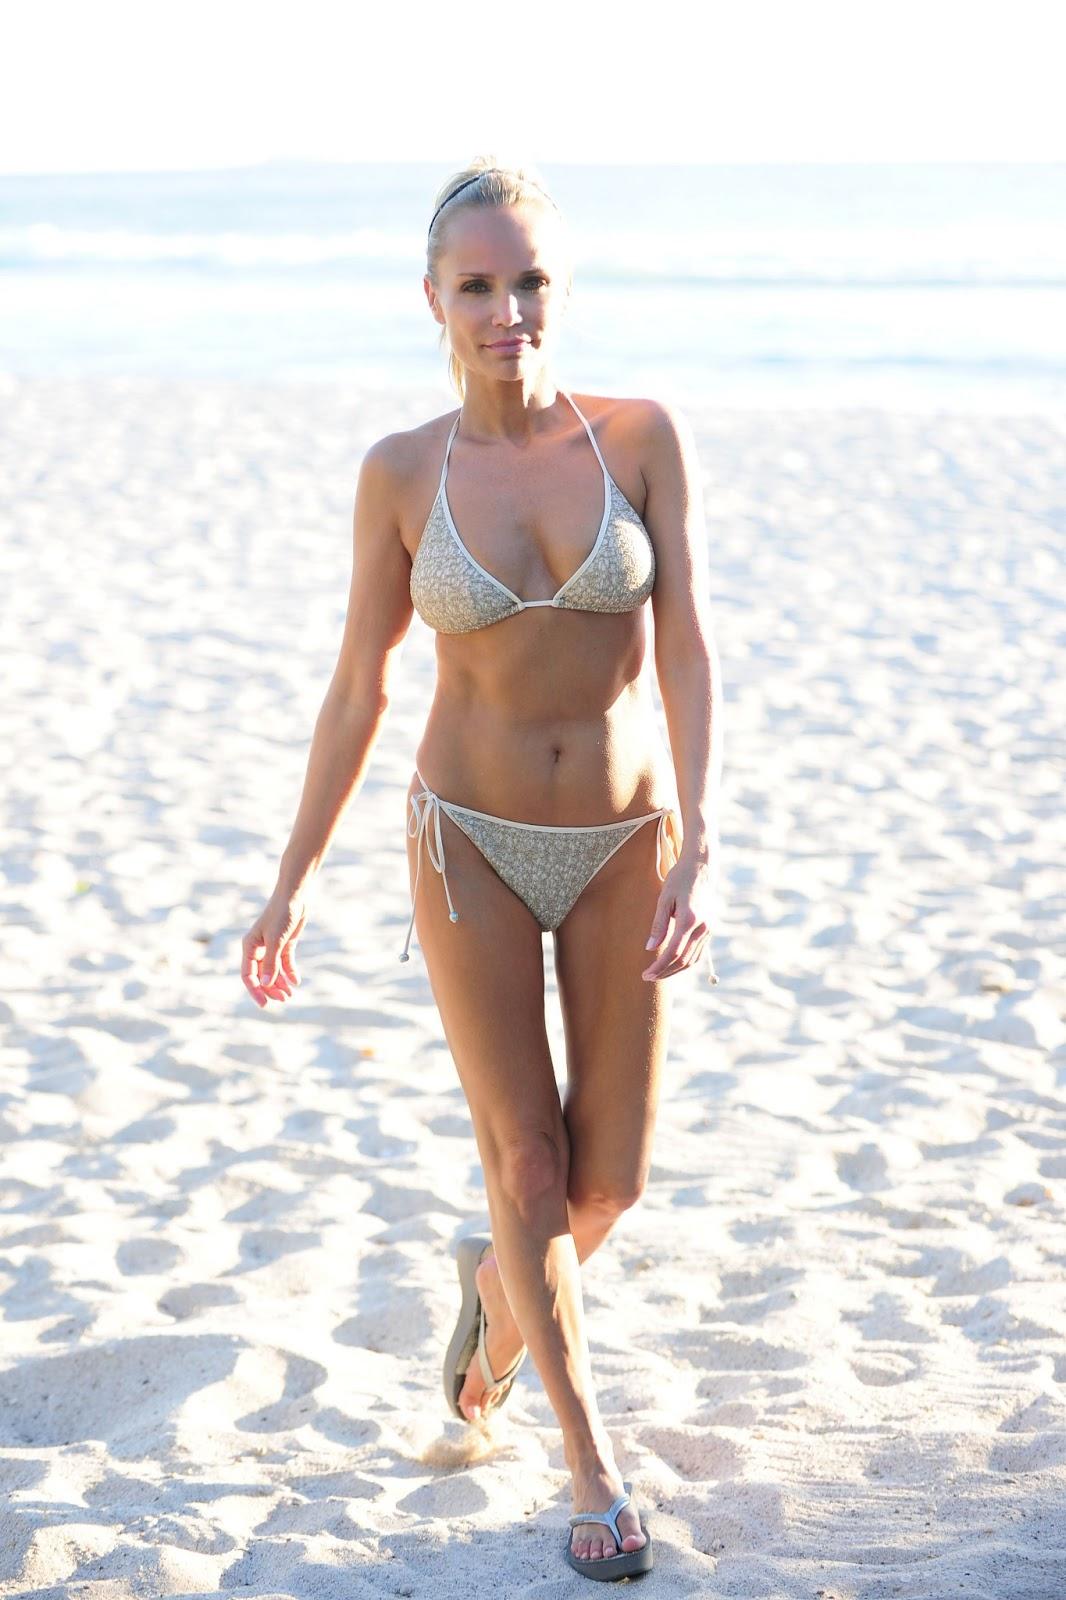 Kristin chenoweth en bikini